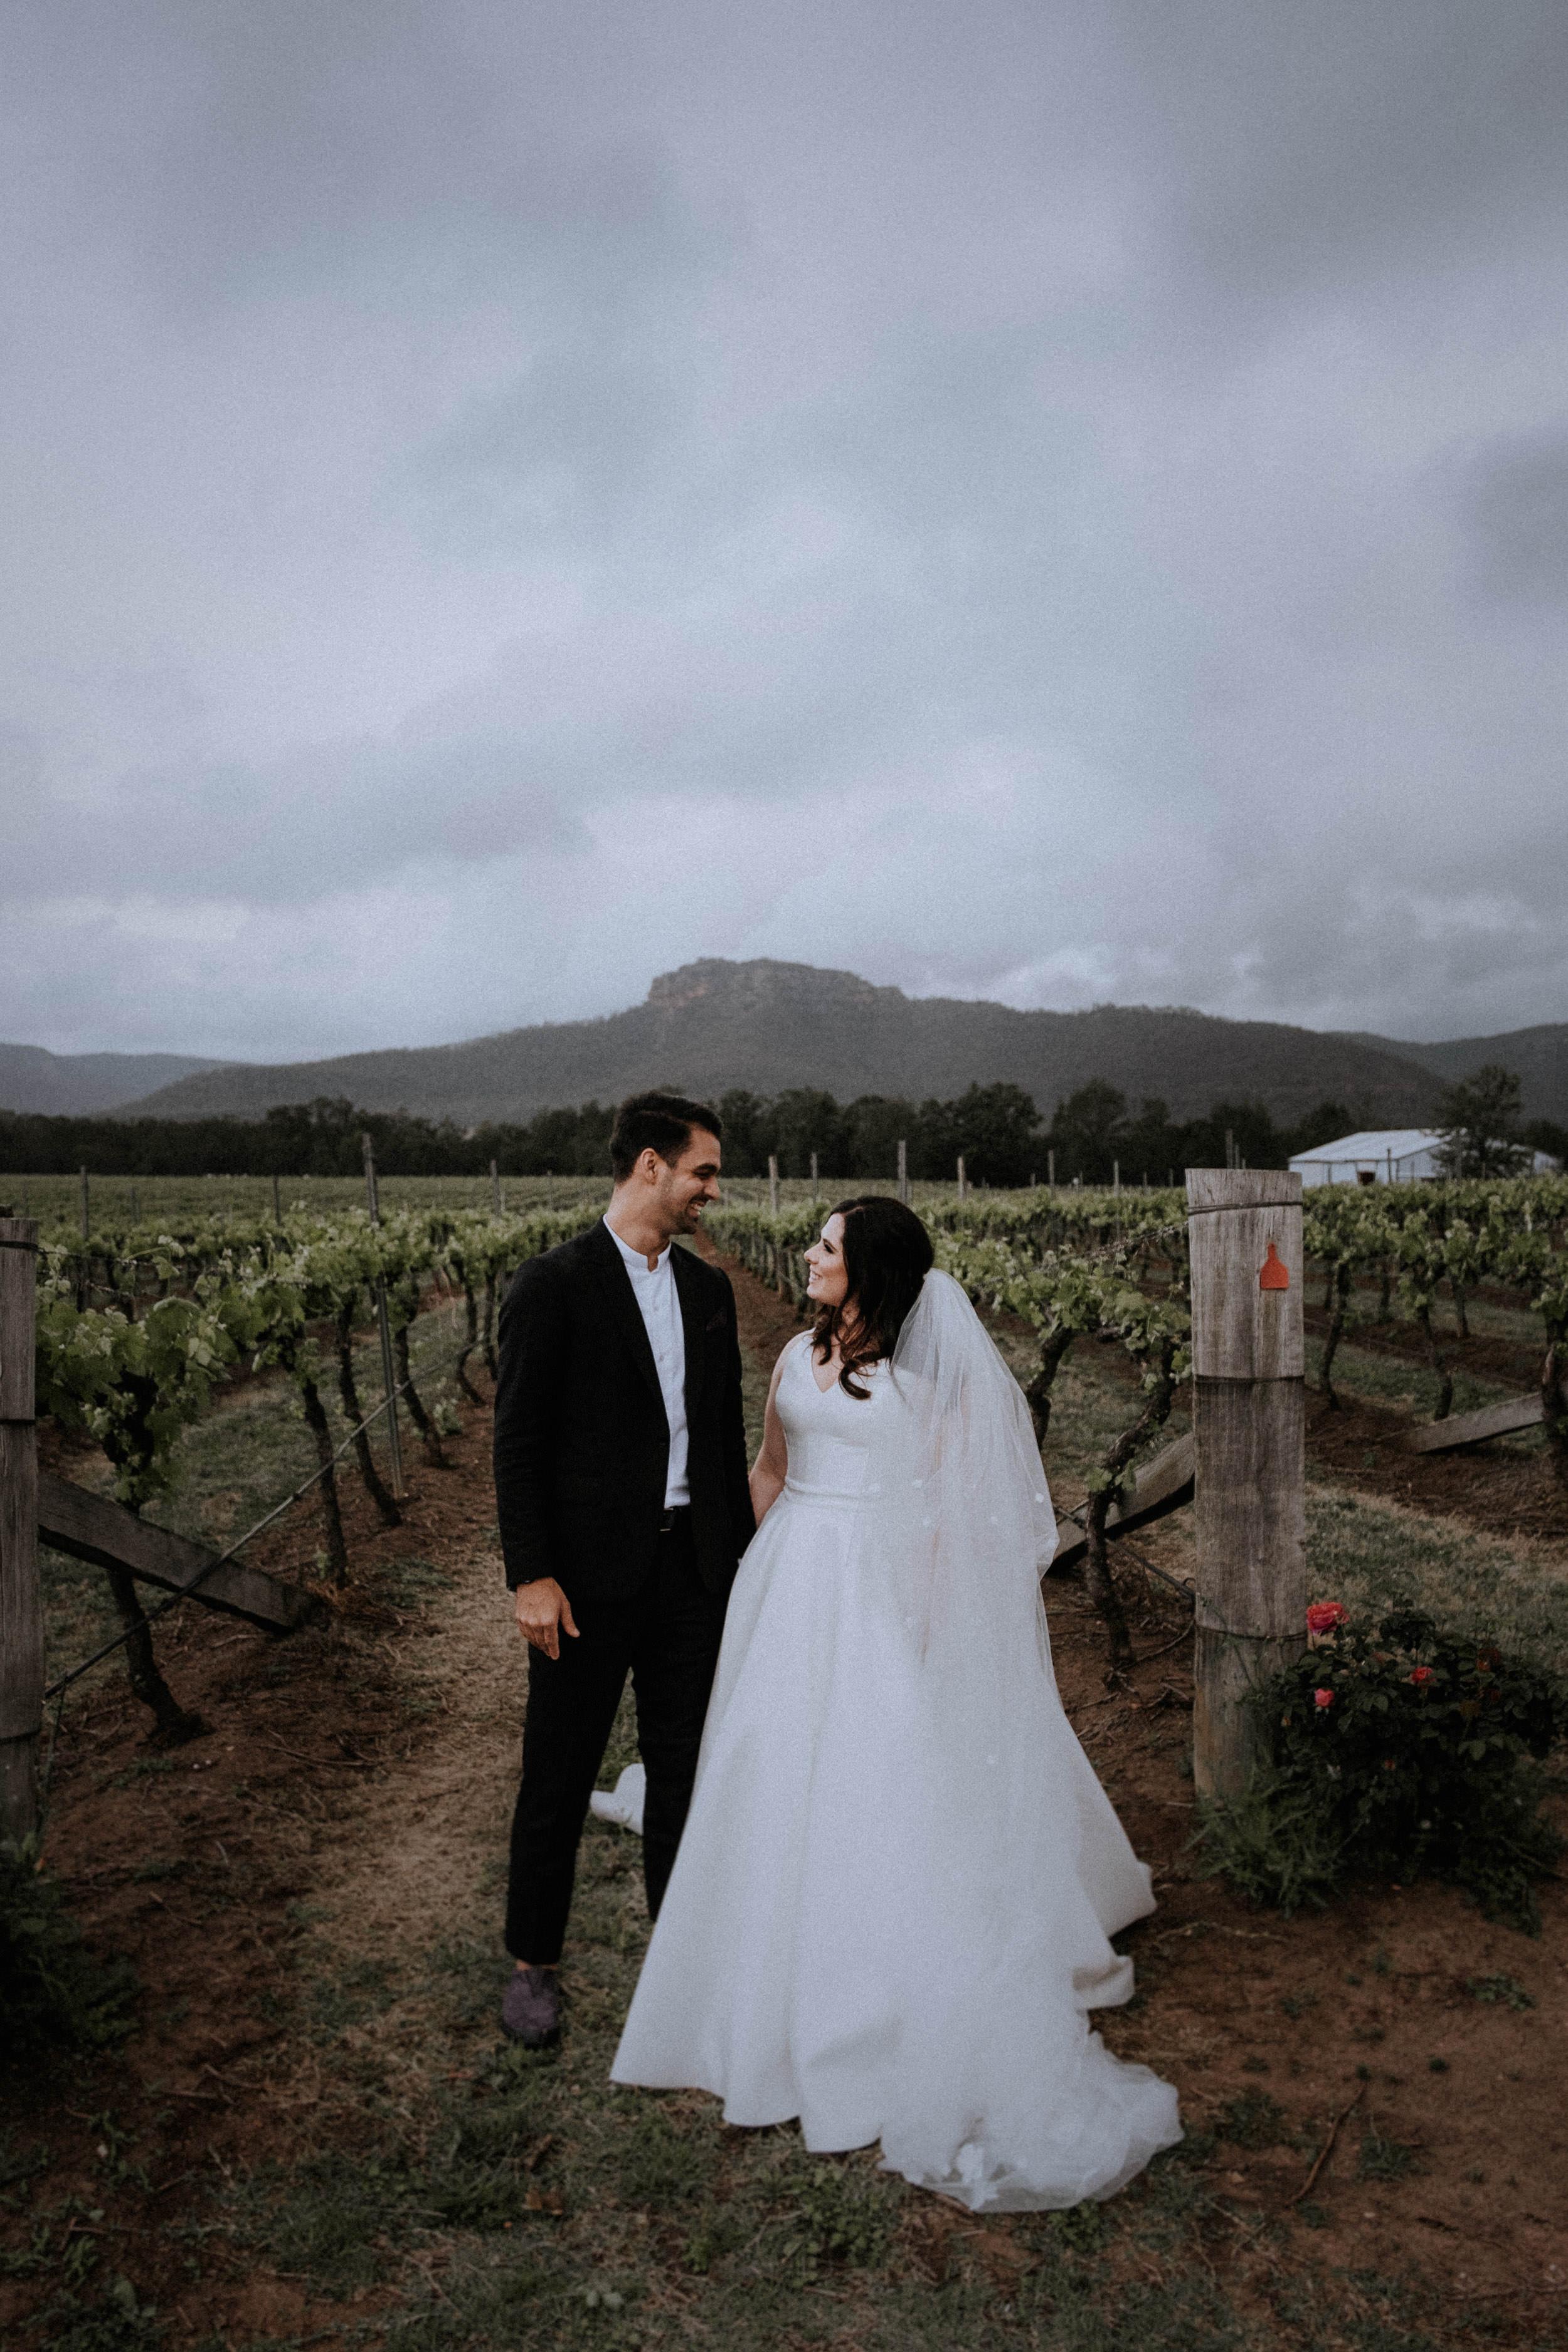 s+j_top_elopement wedding photography_kings & thieves_blog - 434.jpg